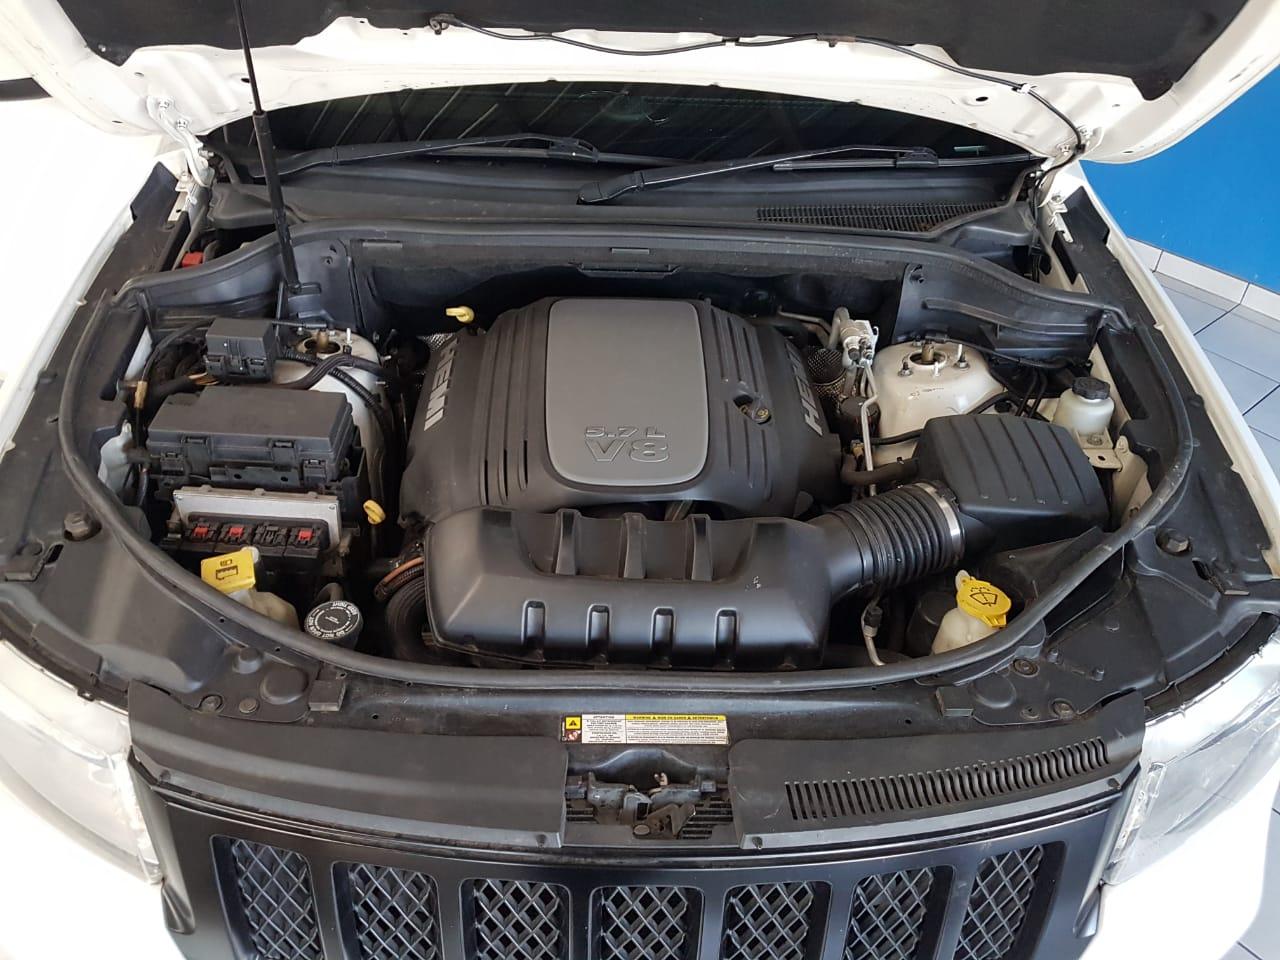 2011 Jeep Grand Cherokee 5.7L Overland